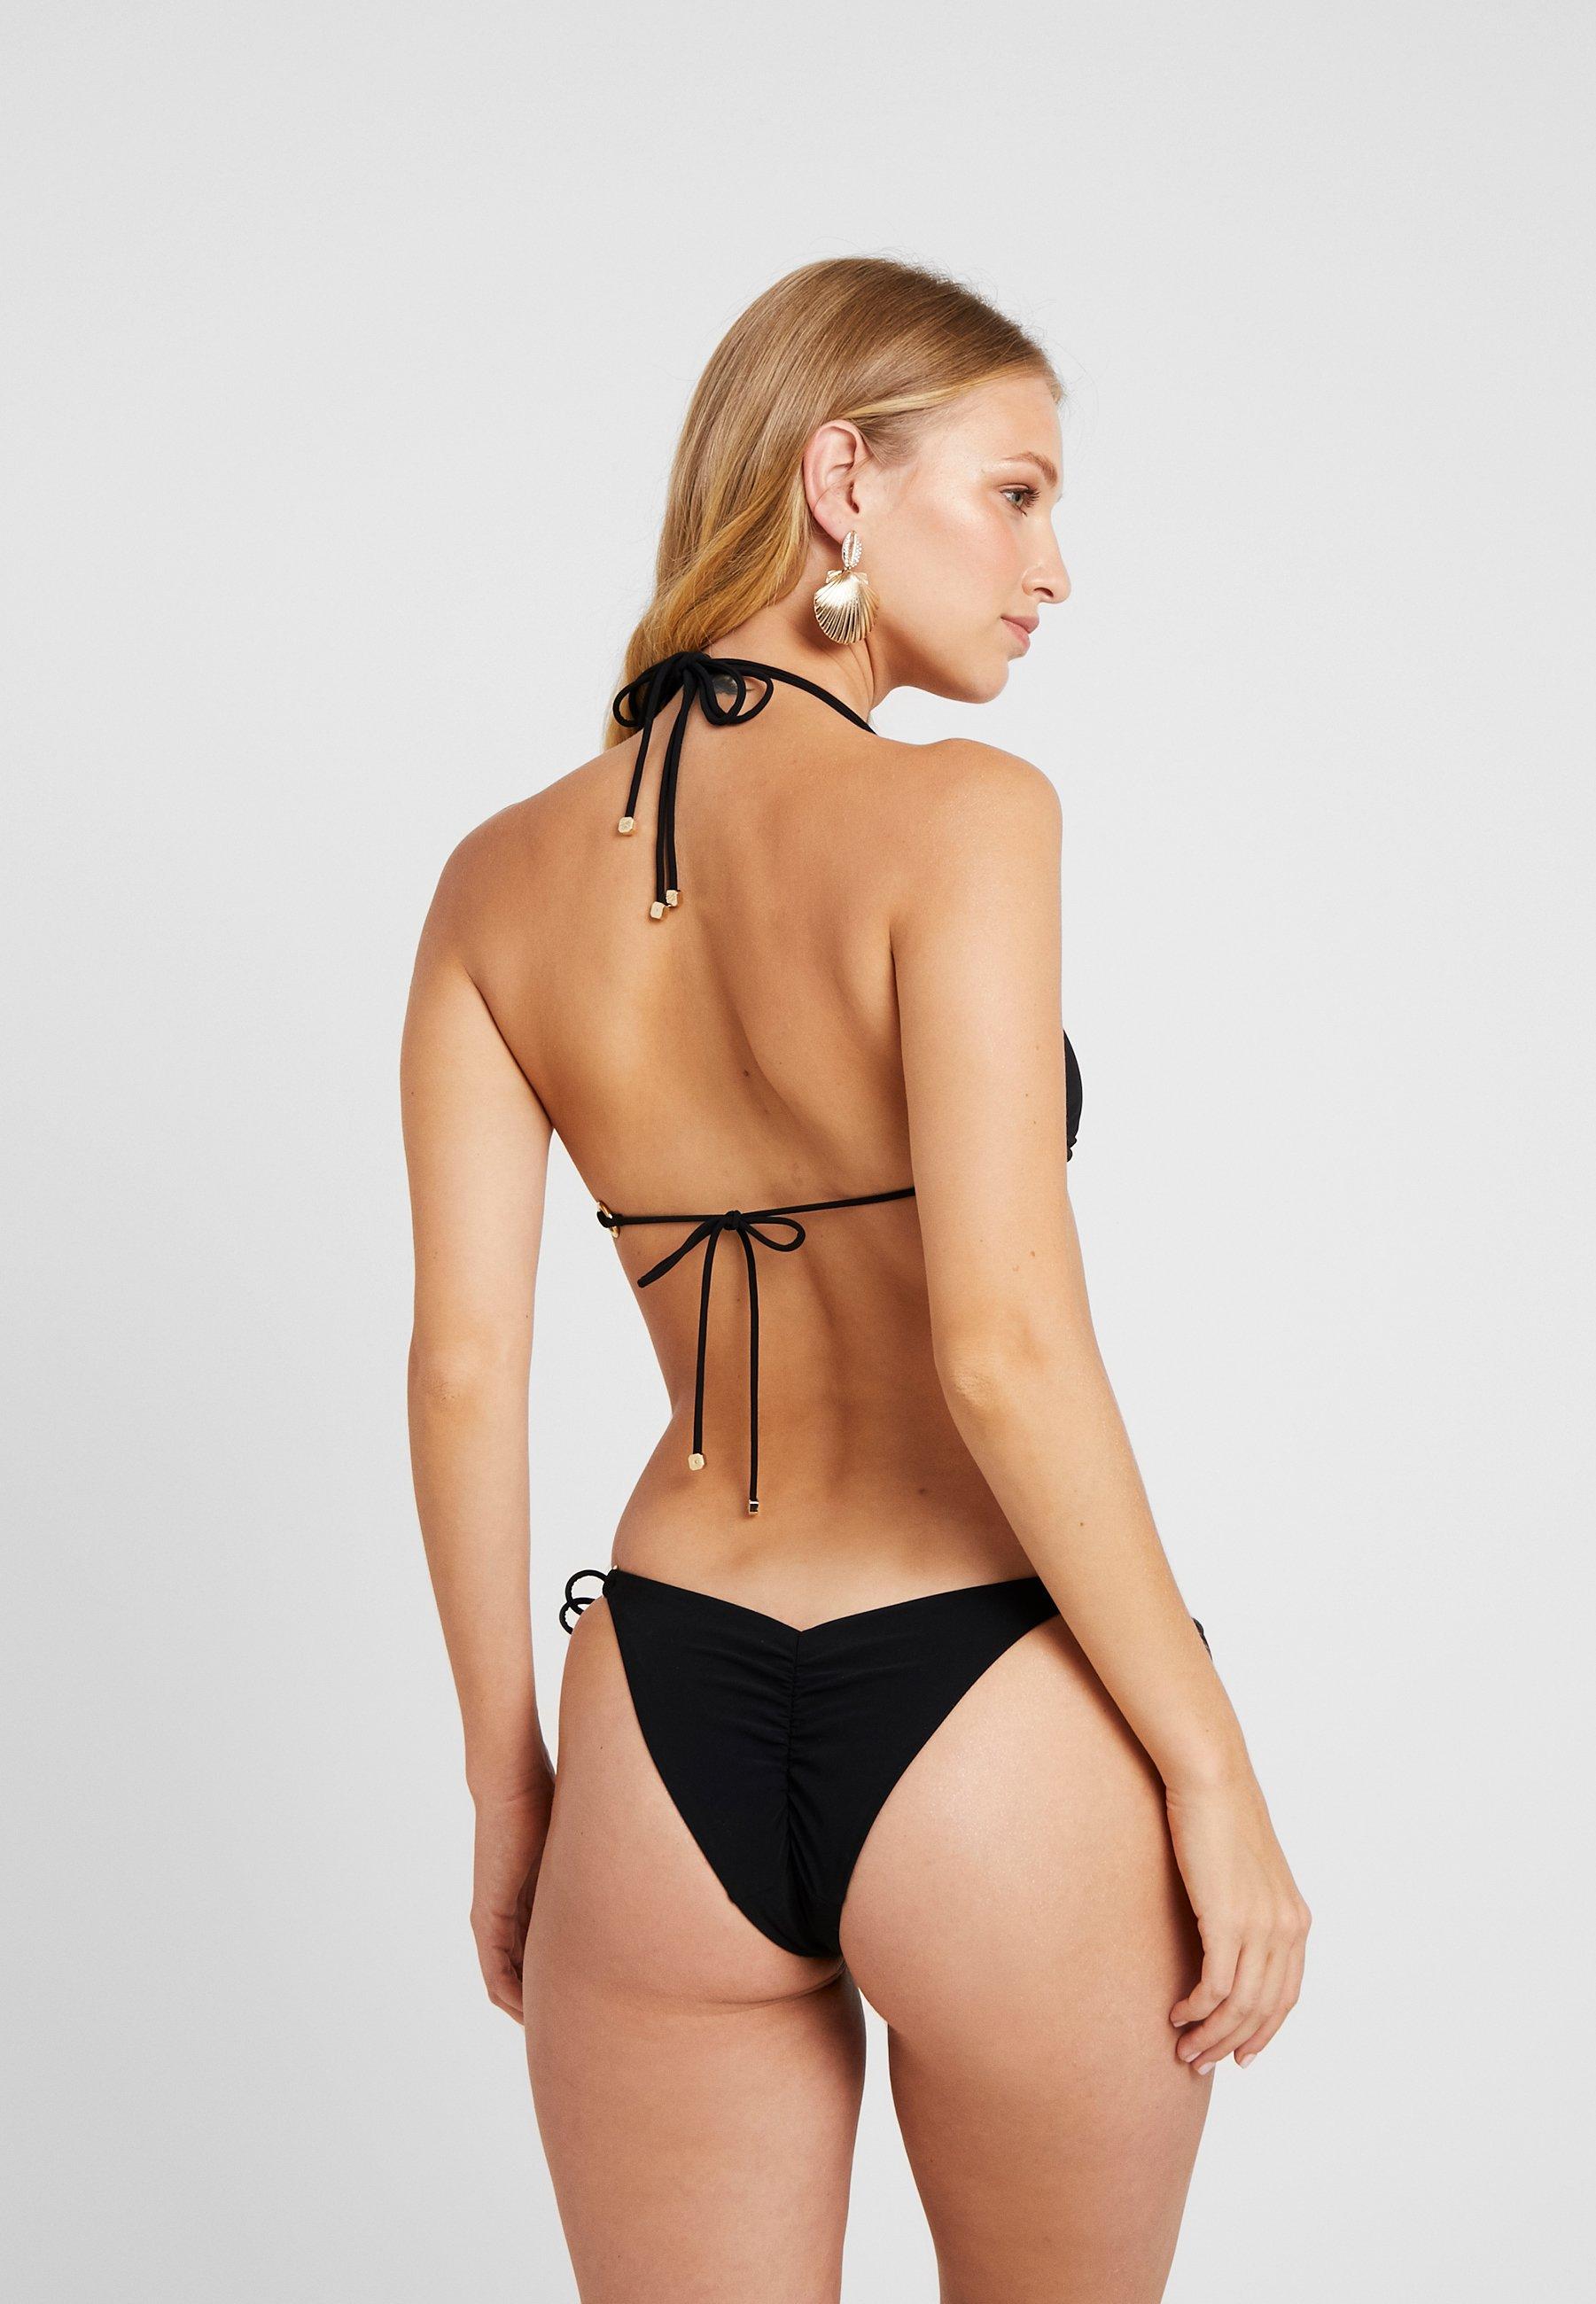 Women MALISA SKIMPY STRAPPY TRIANGLE - Bikini top